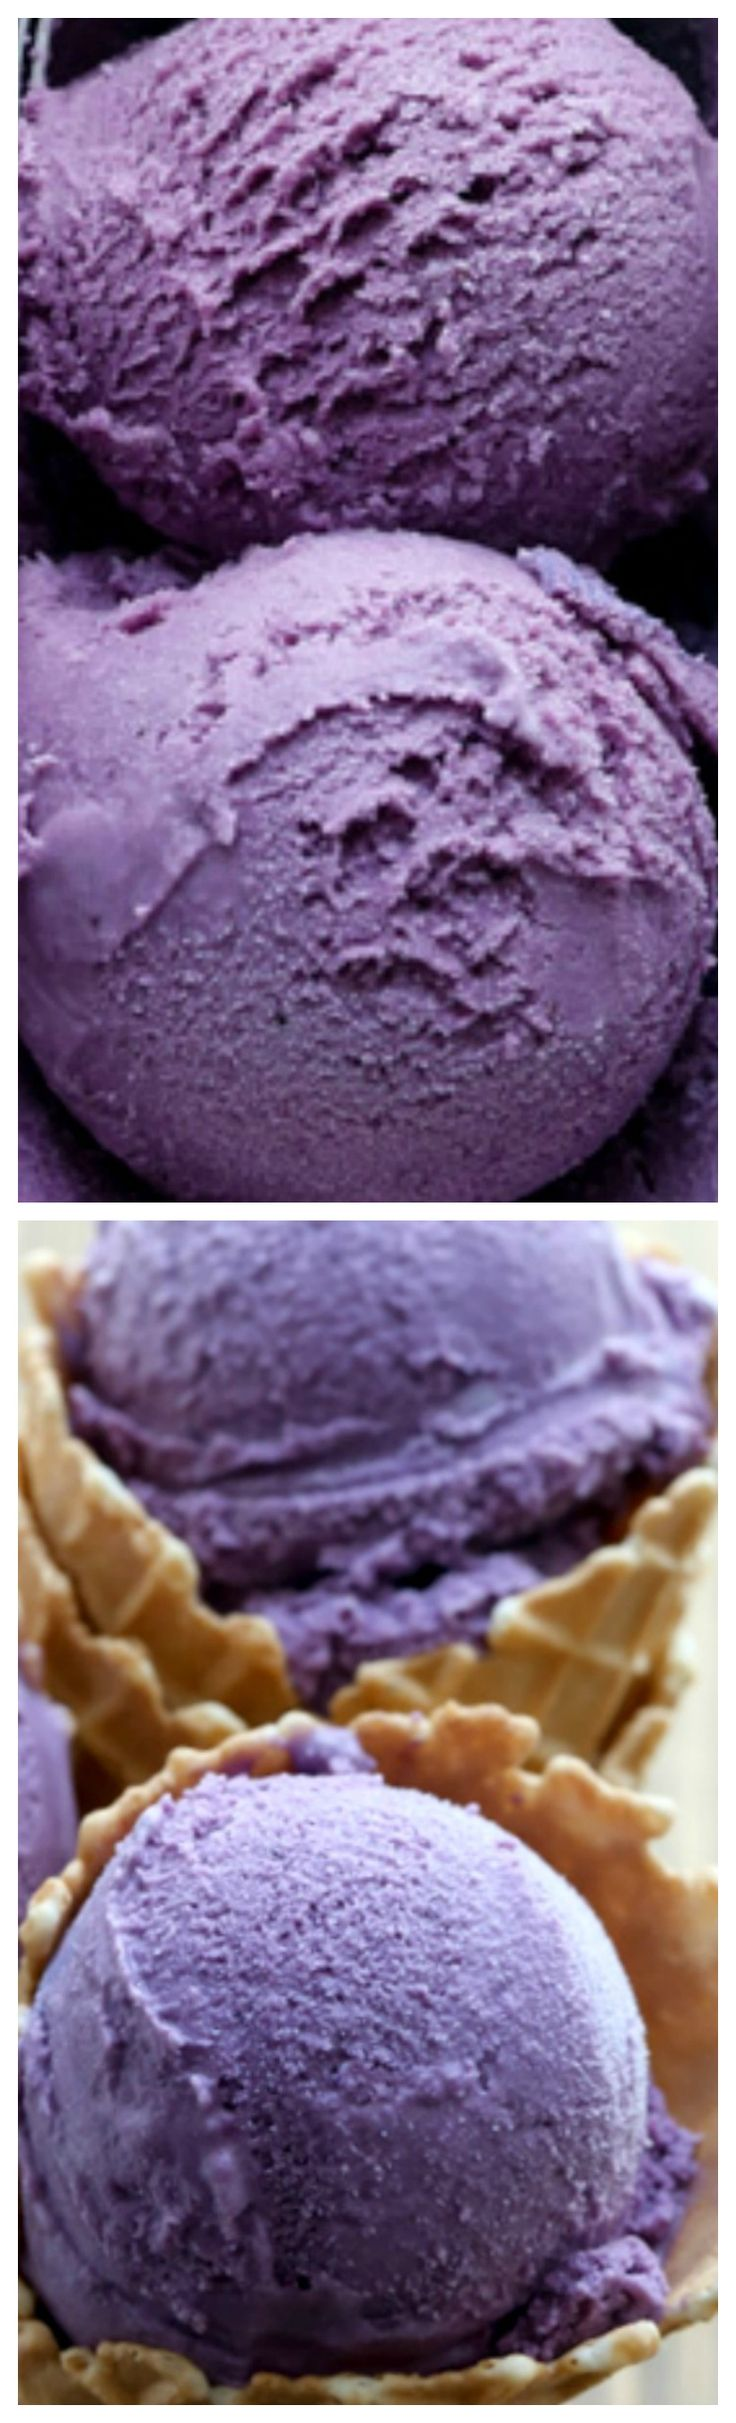 Blueberry Ice Cream ~ Creamy homemade blueberry ice cream bursting with flavor!